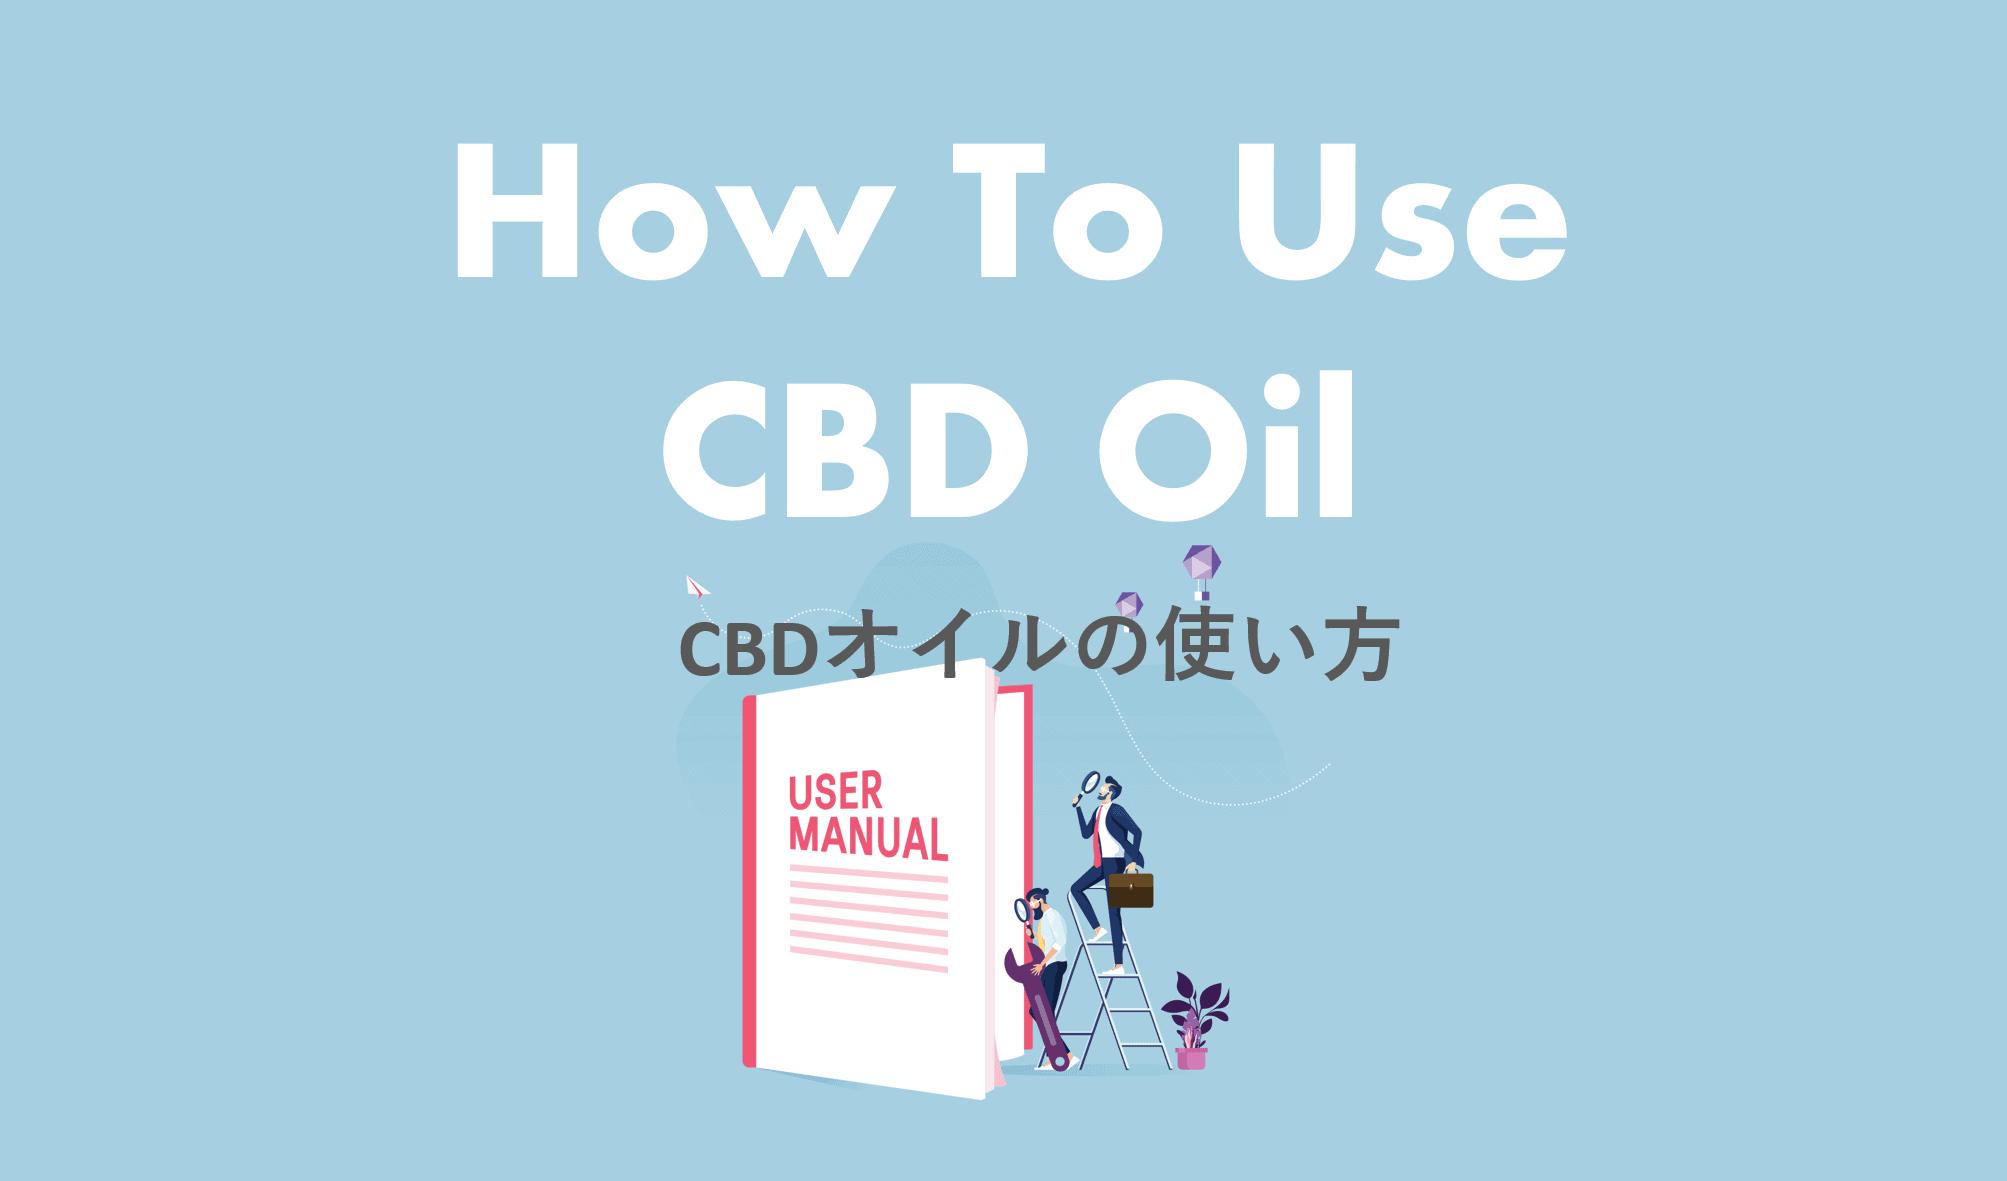 CBDオイル 使い方